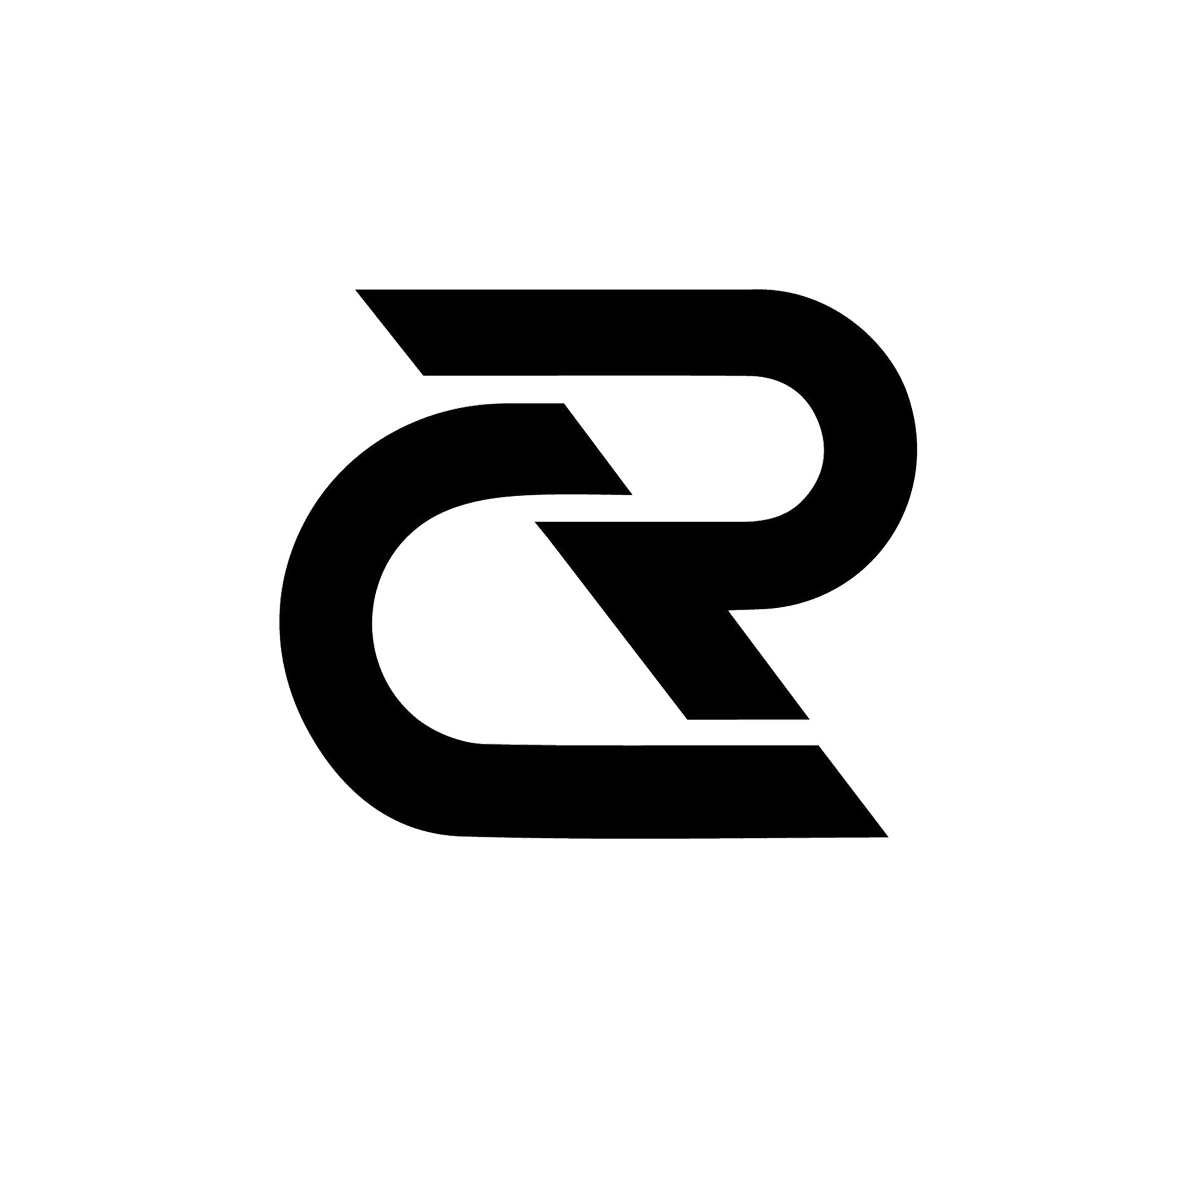 CR Personaltraining